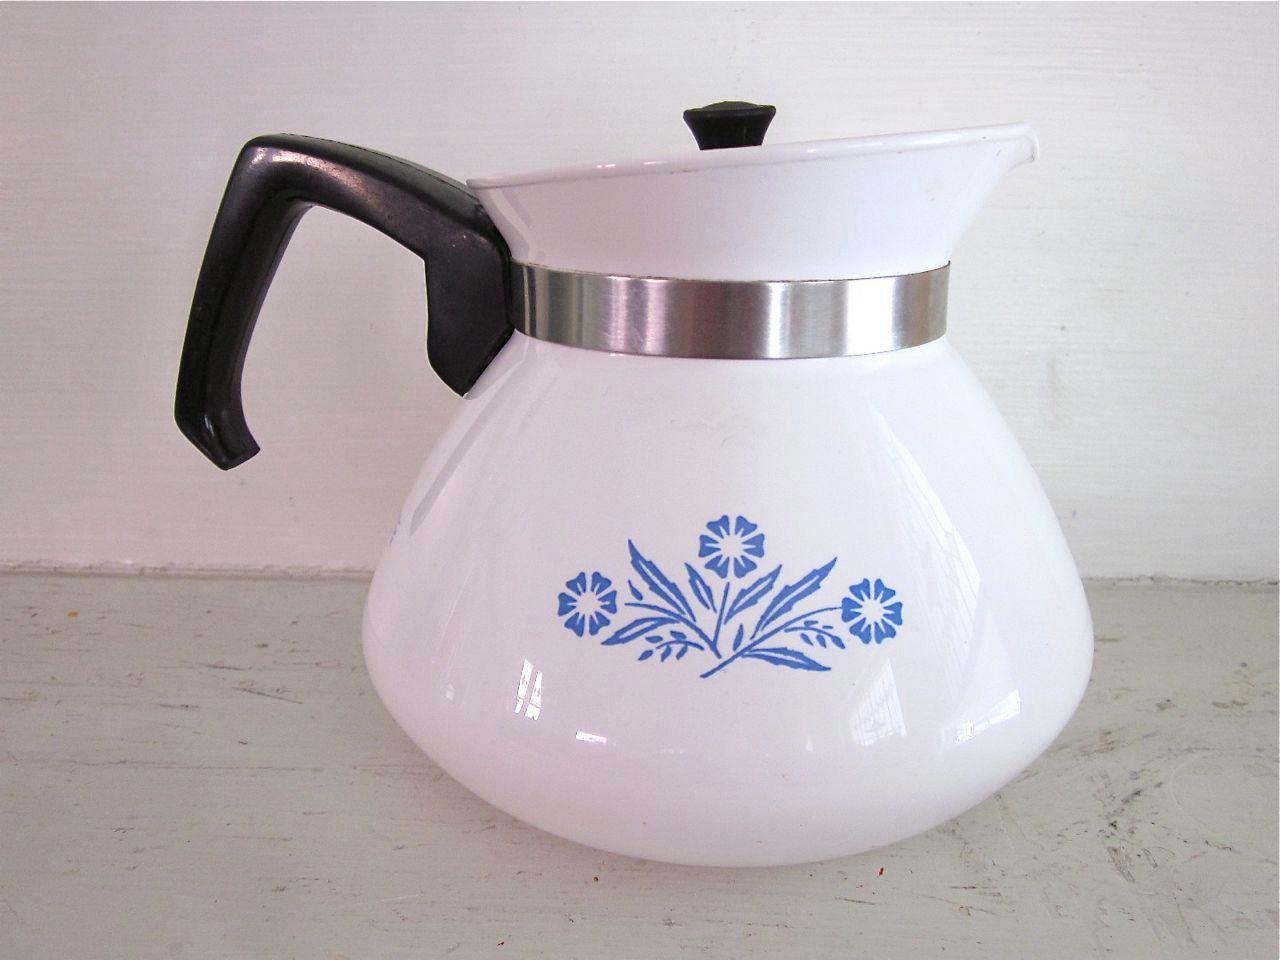 corningware cornflower tea kettle  stovetop teapot  via  - corningware cornflower tea kettle  stovetop teapot  via etsy